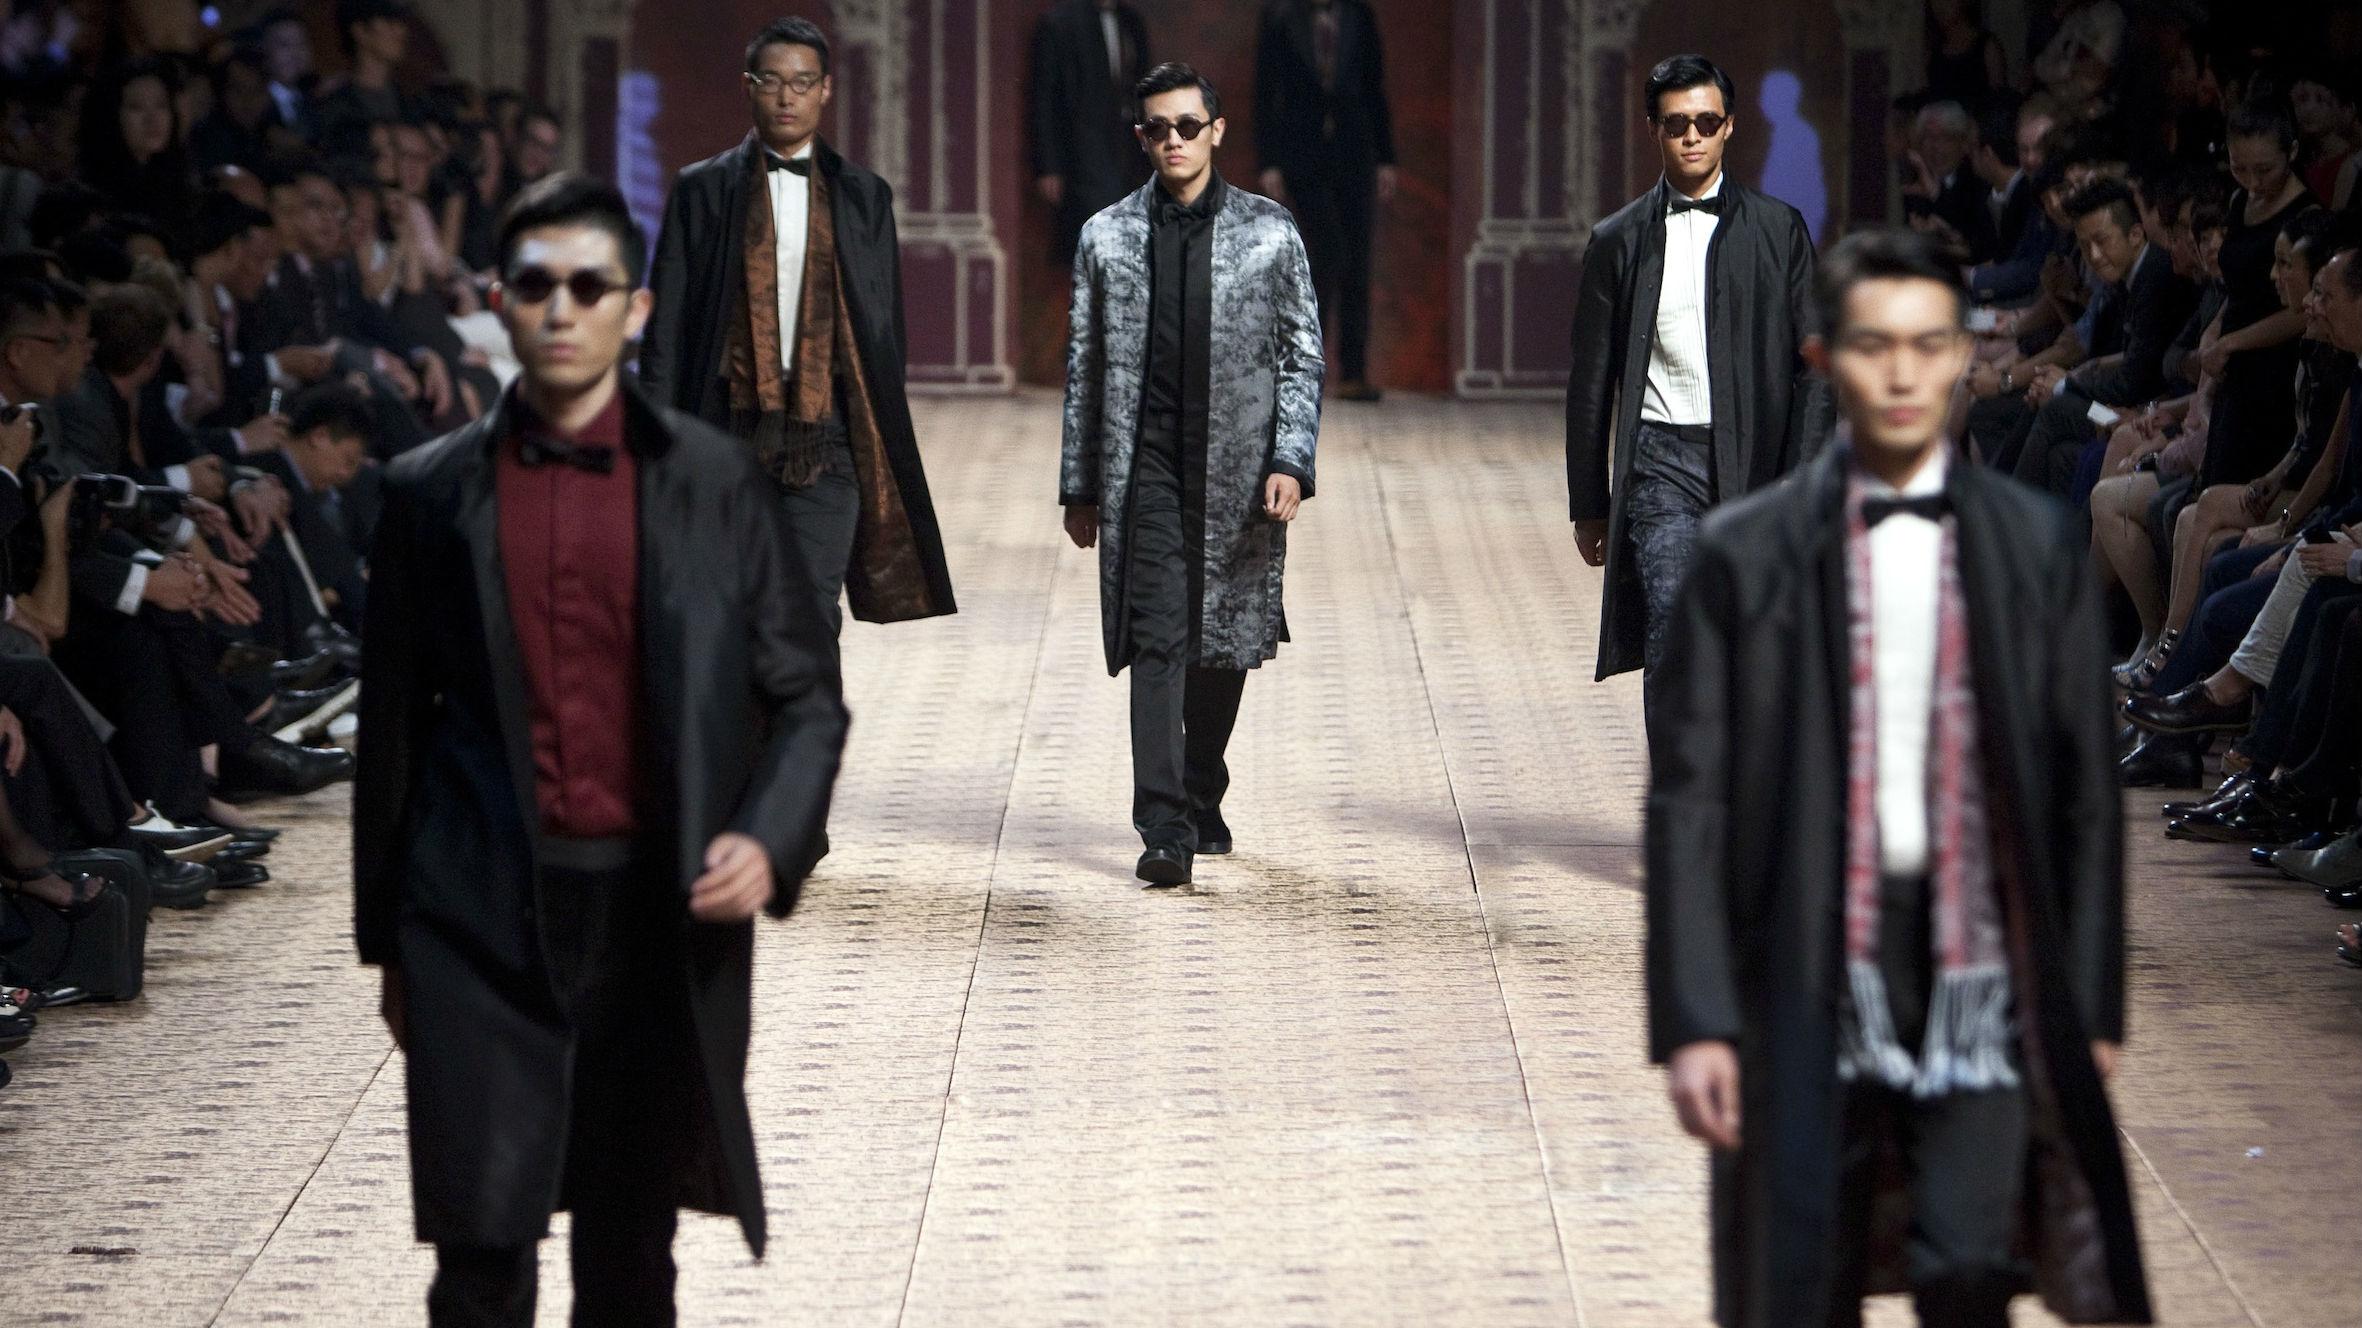 Ermenegildo Zegna and other luxury brands reported rebounding demand in China.